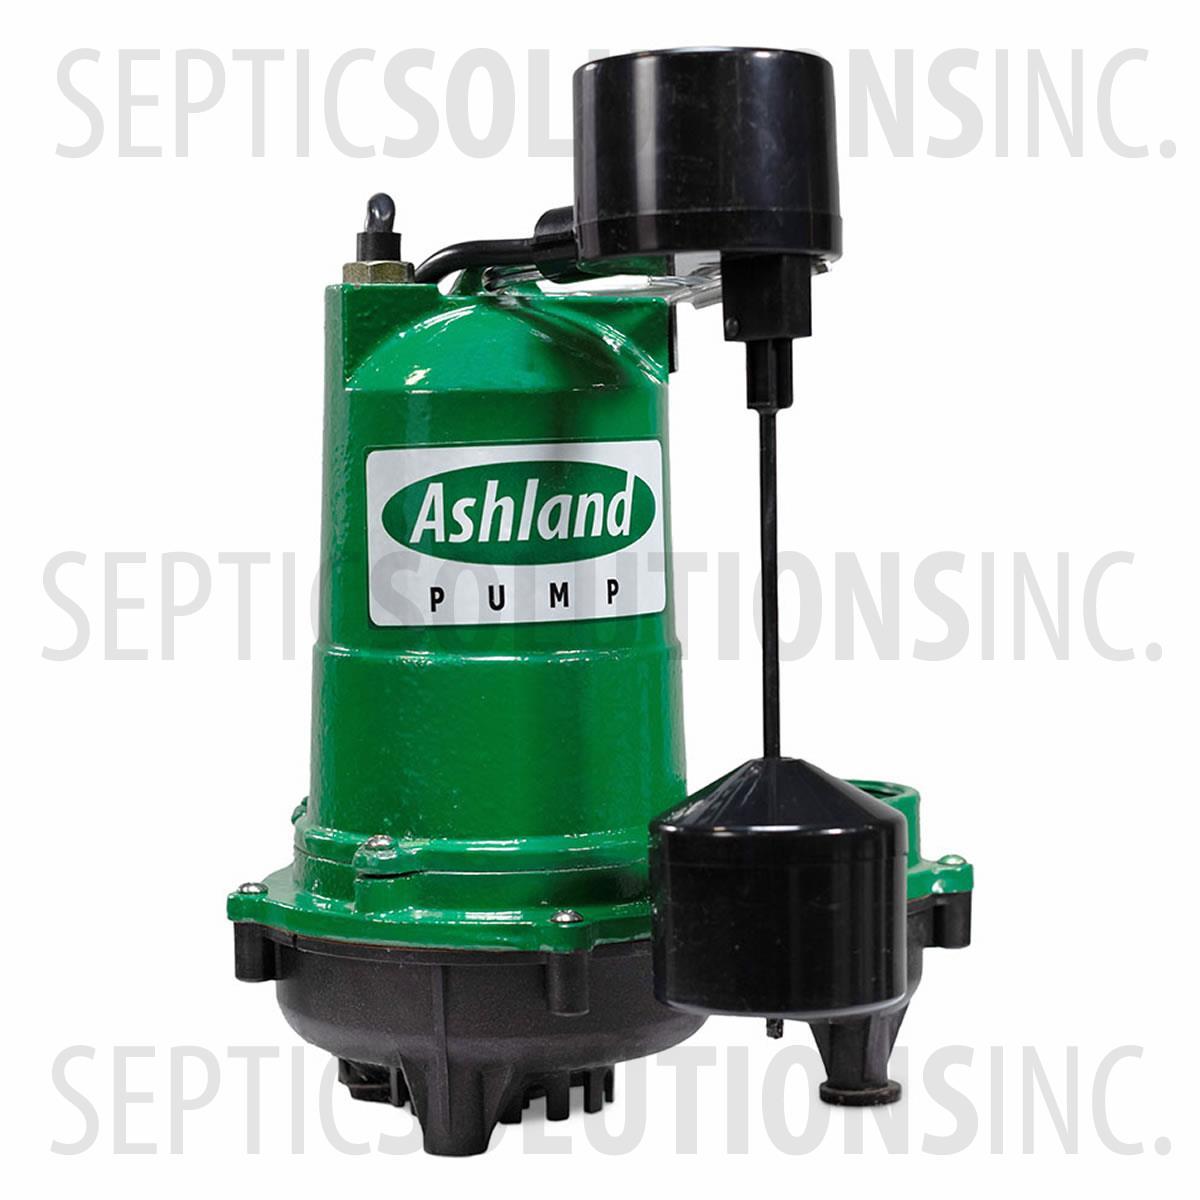 Ashland B50v 1 2 Hp Cast Iron Submersible Sump Pump